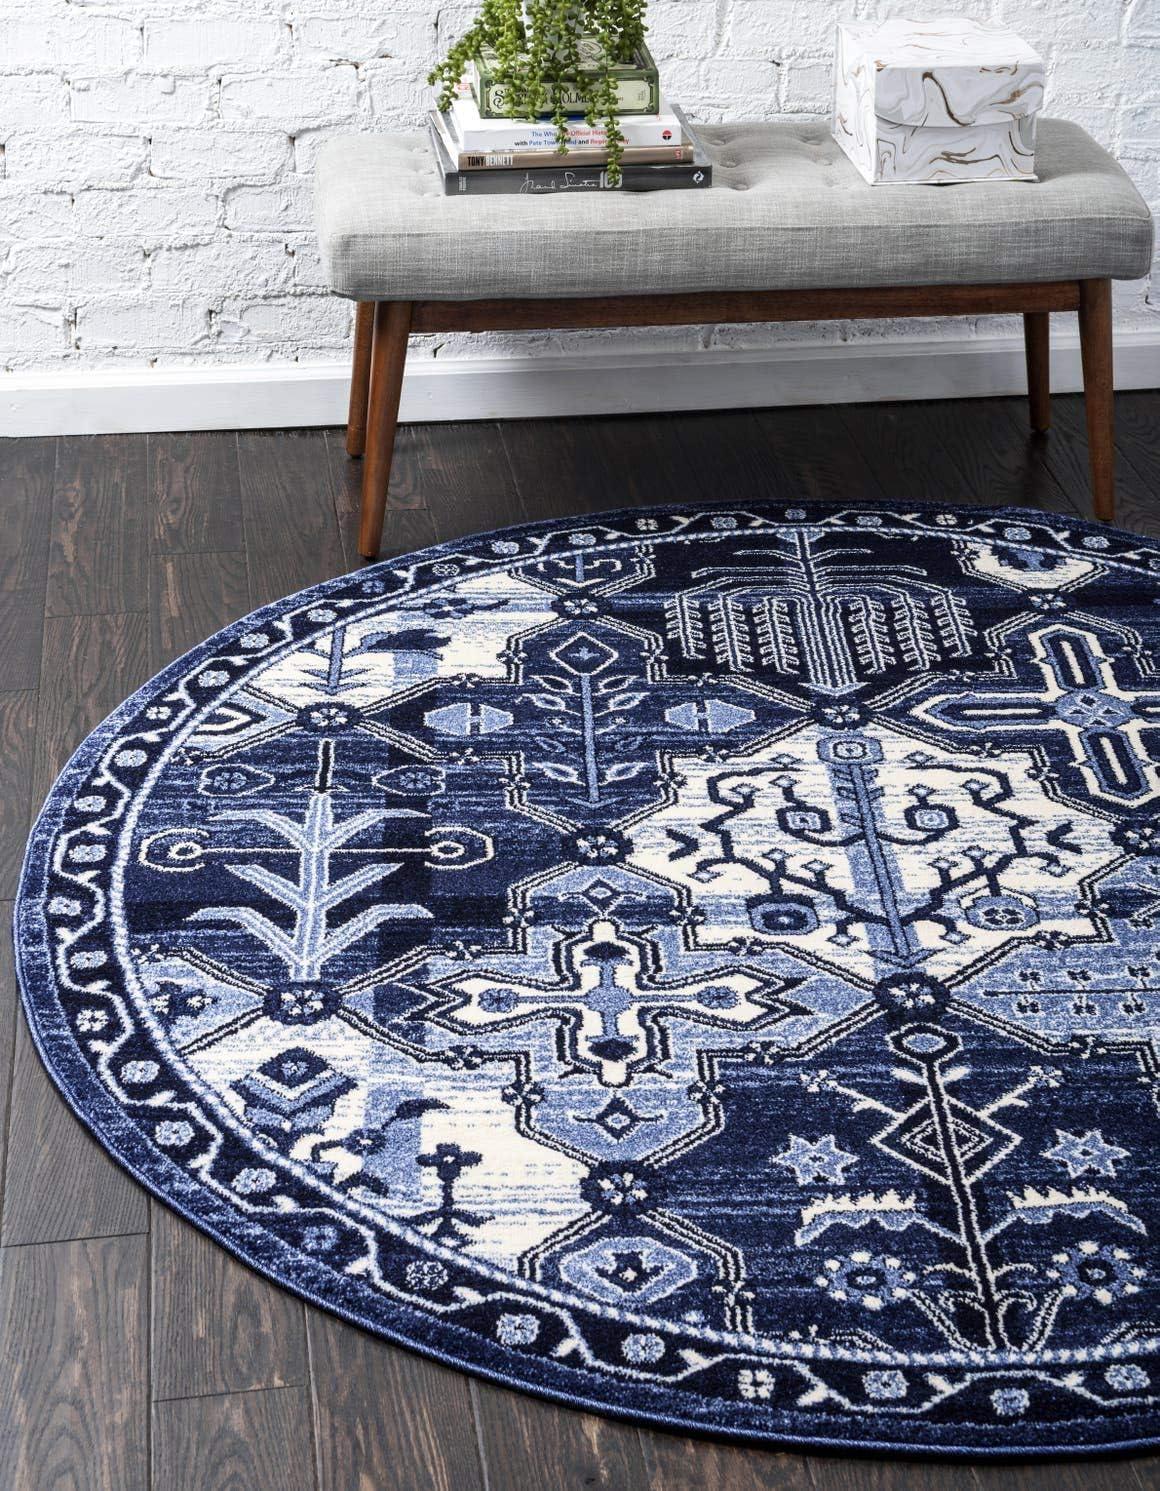 Unique Loom La Jolla Collection Tone-on-Tone Traditional Blue Round Rug 6 0 x 6 0